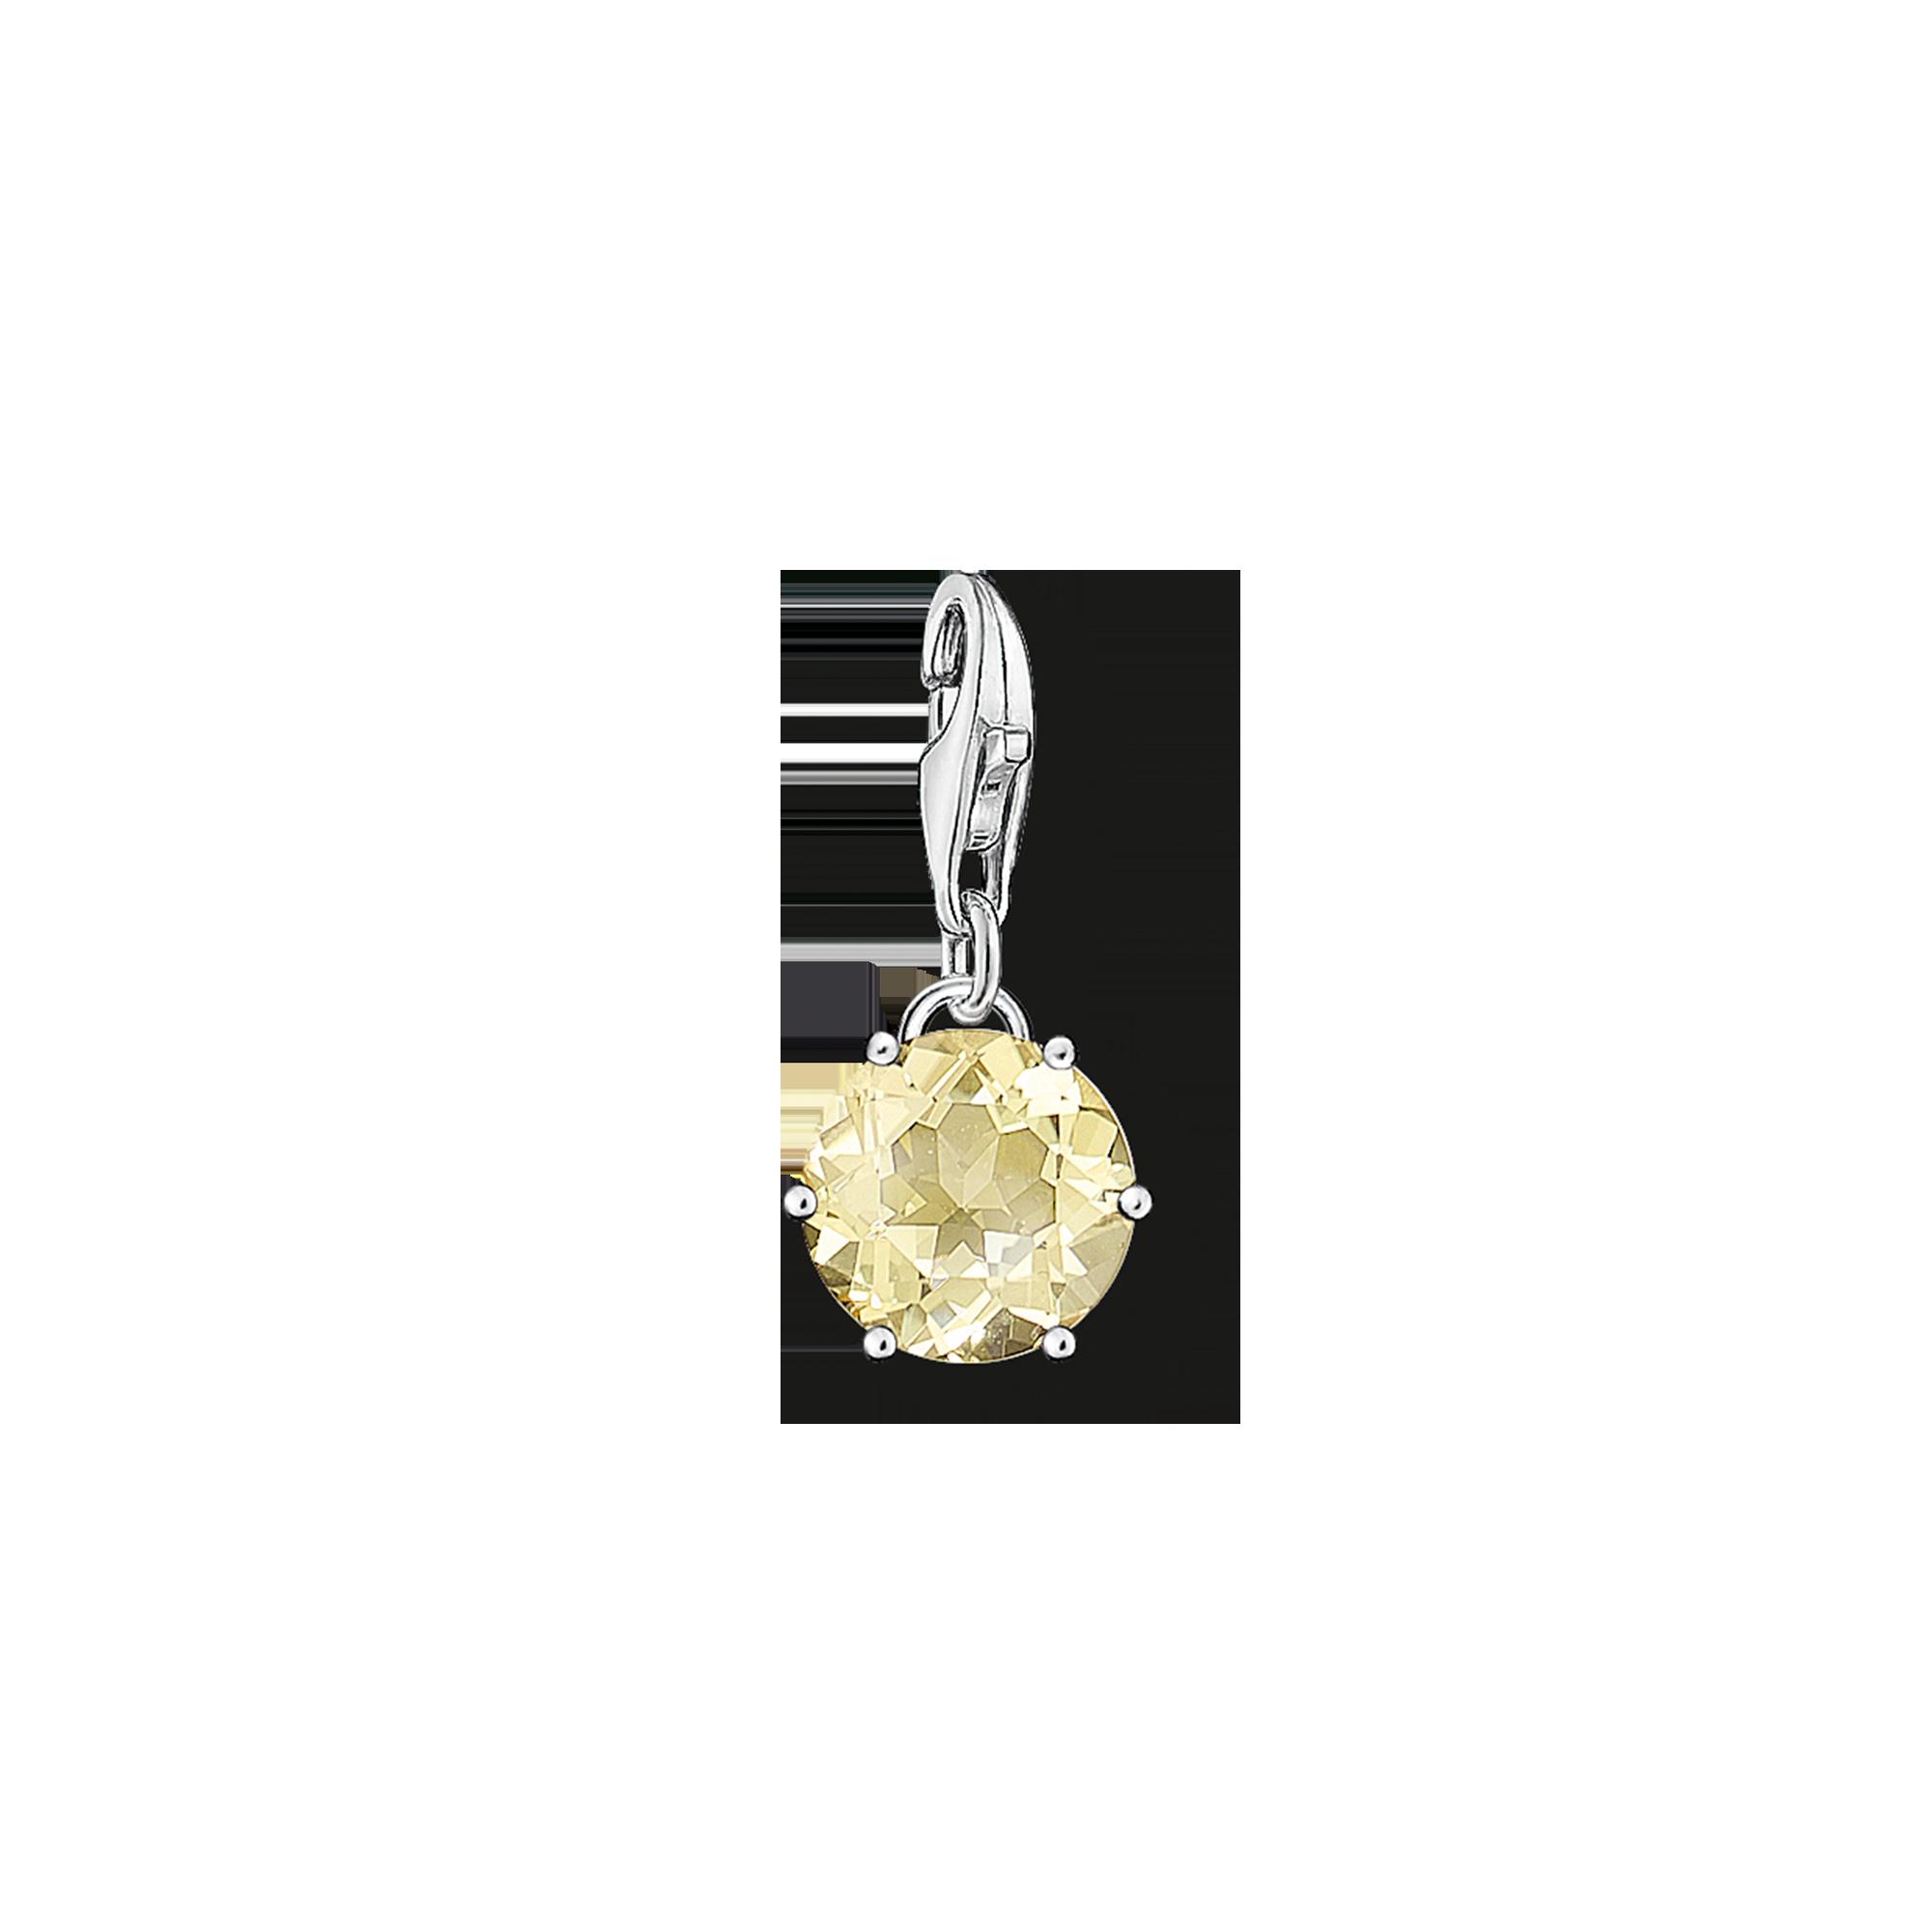 "Thomas Sabo - Charm pendant ""birth stone November"" - 1"